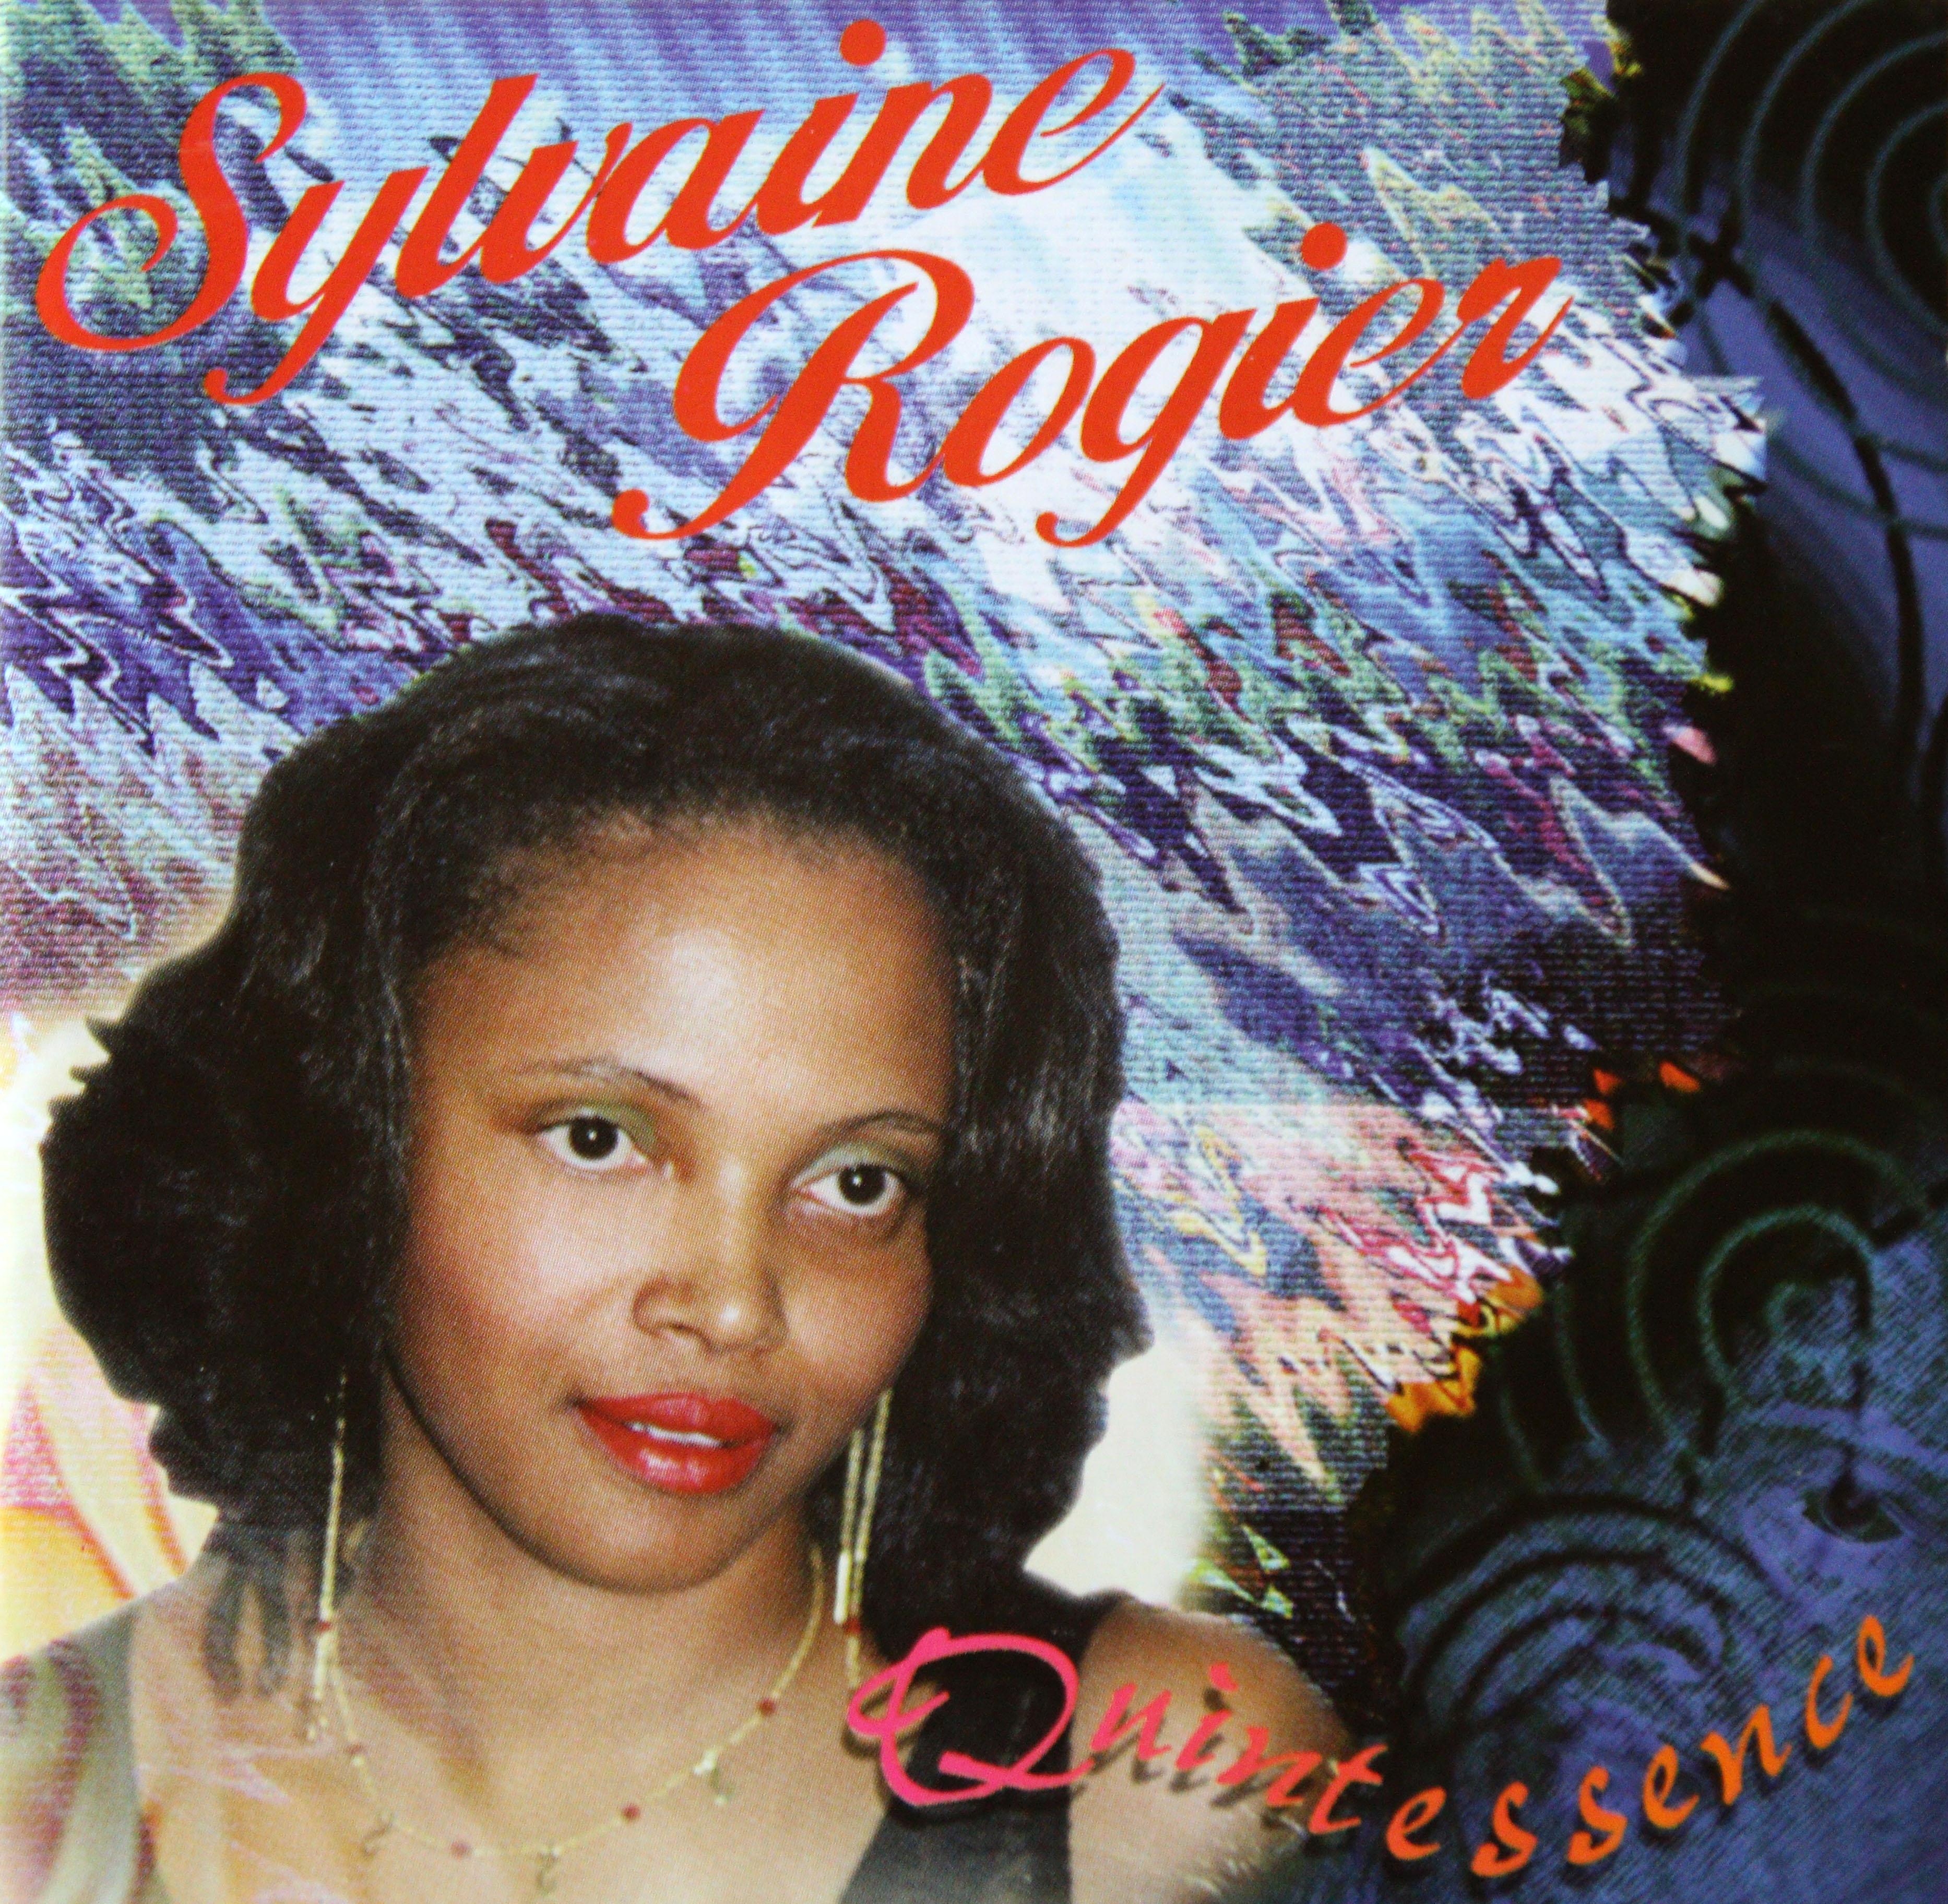 Sylvaine Rogier Quintescence